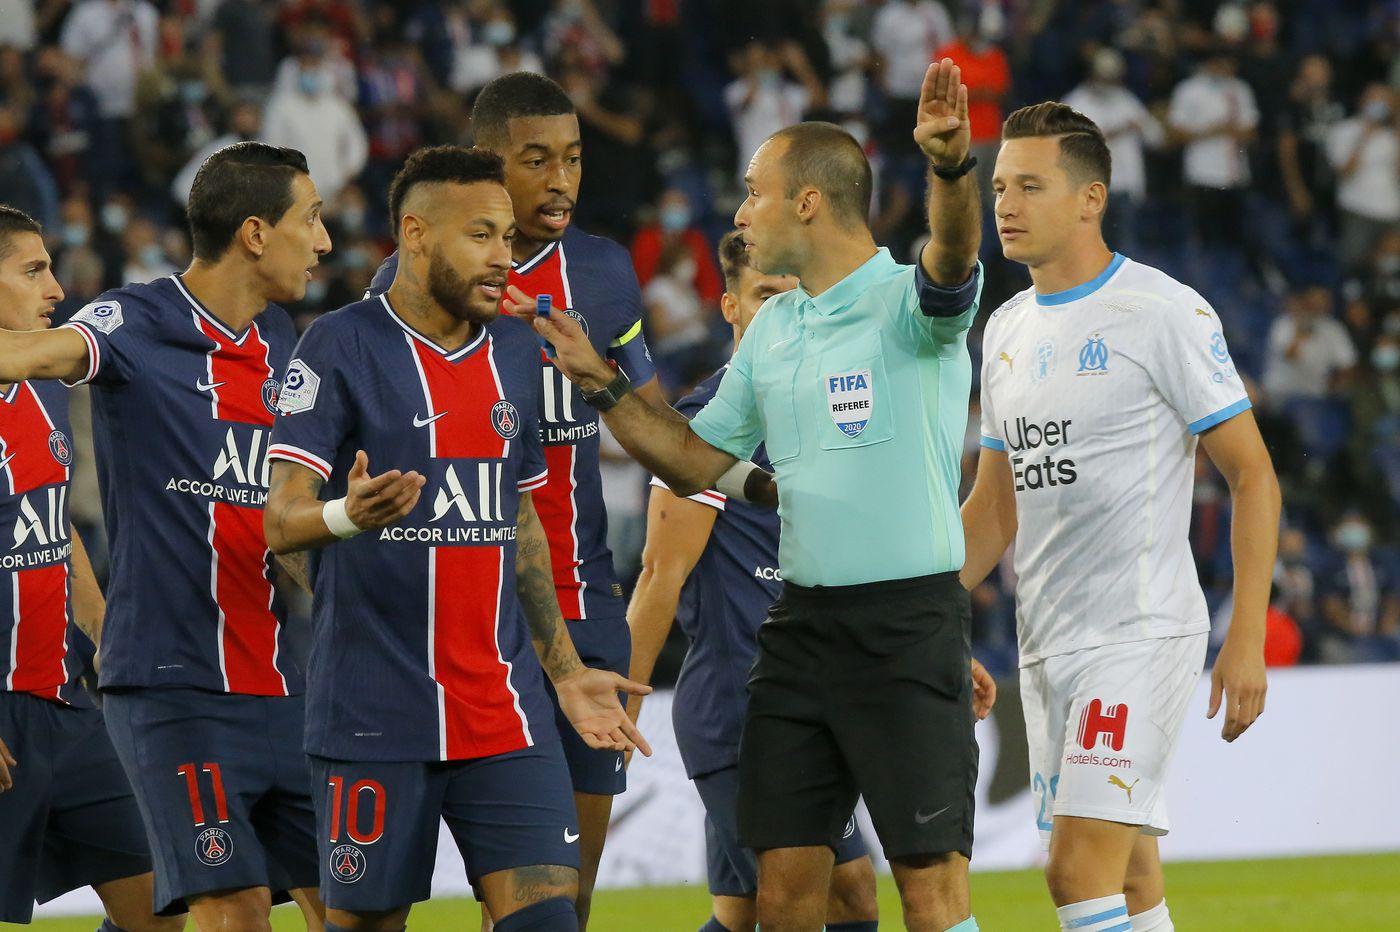 How To Watch France S Ligue 1 On Bein Sports Paris Saint Germain Vs Metz Marseille Vs Saint Etienne